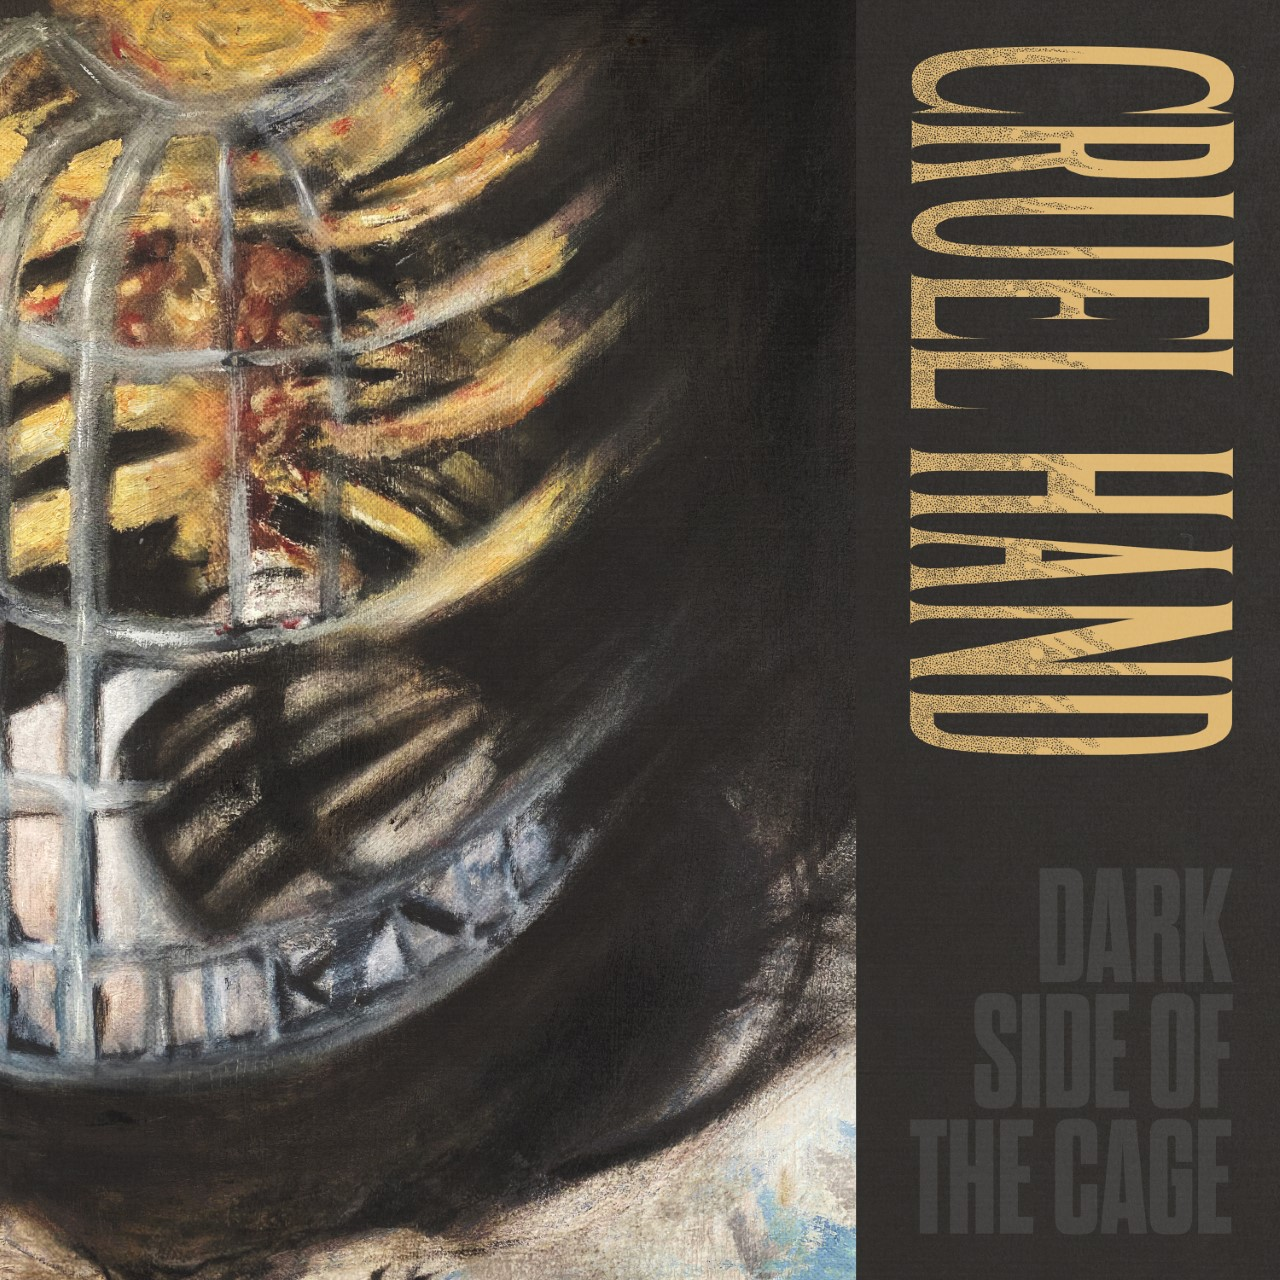 Cruel Hand - Dark Side Of The Cage (2020)